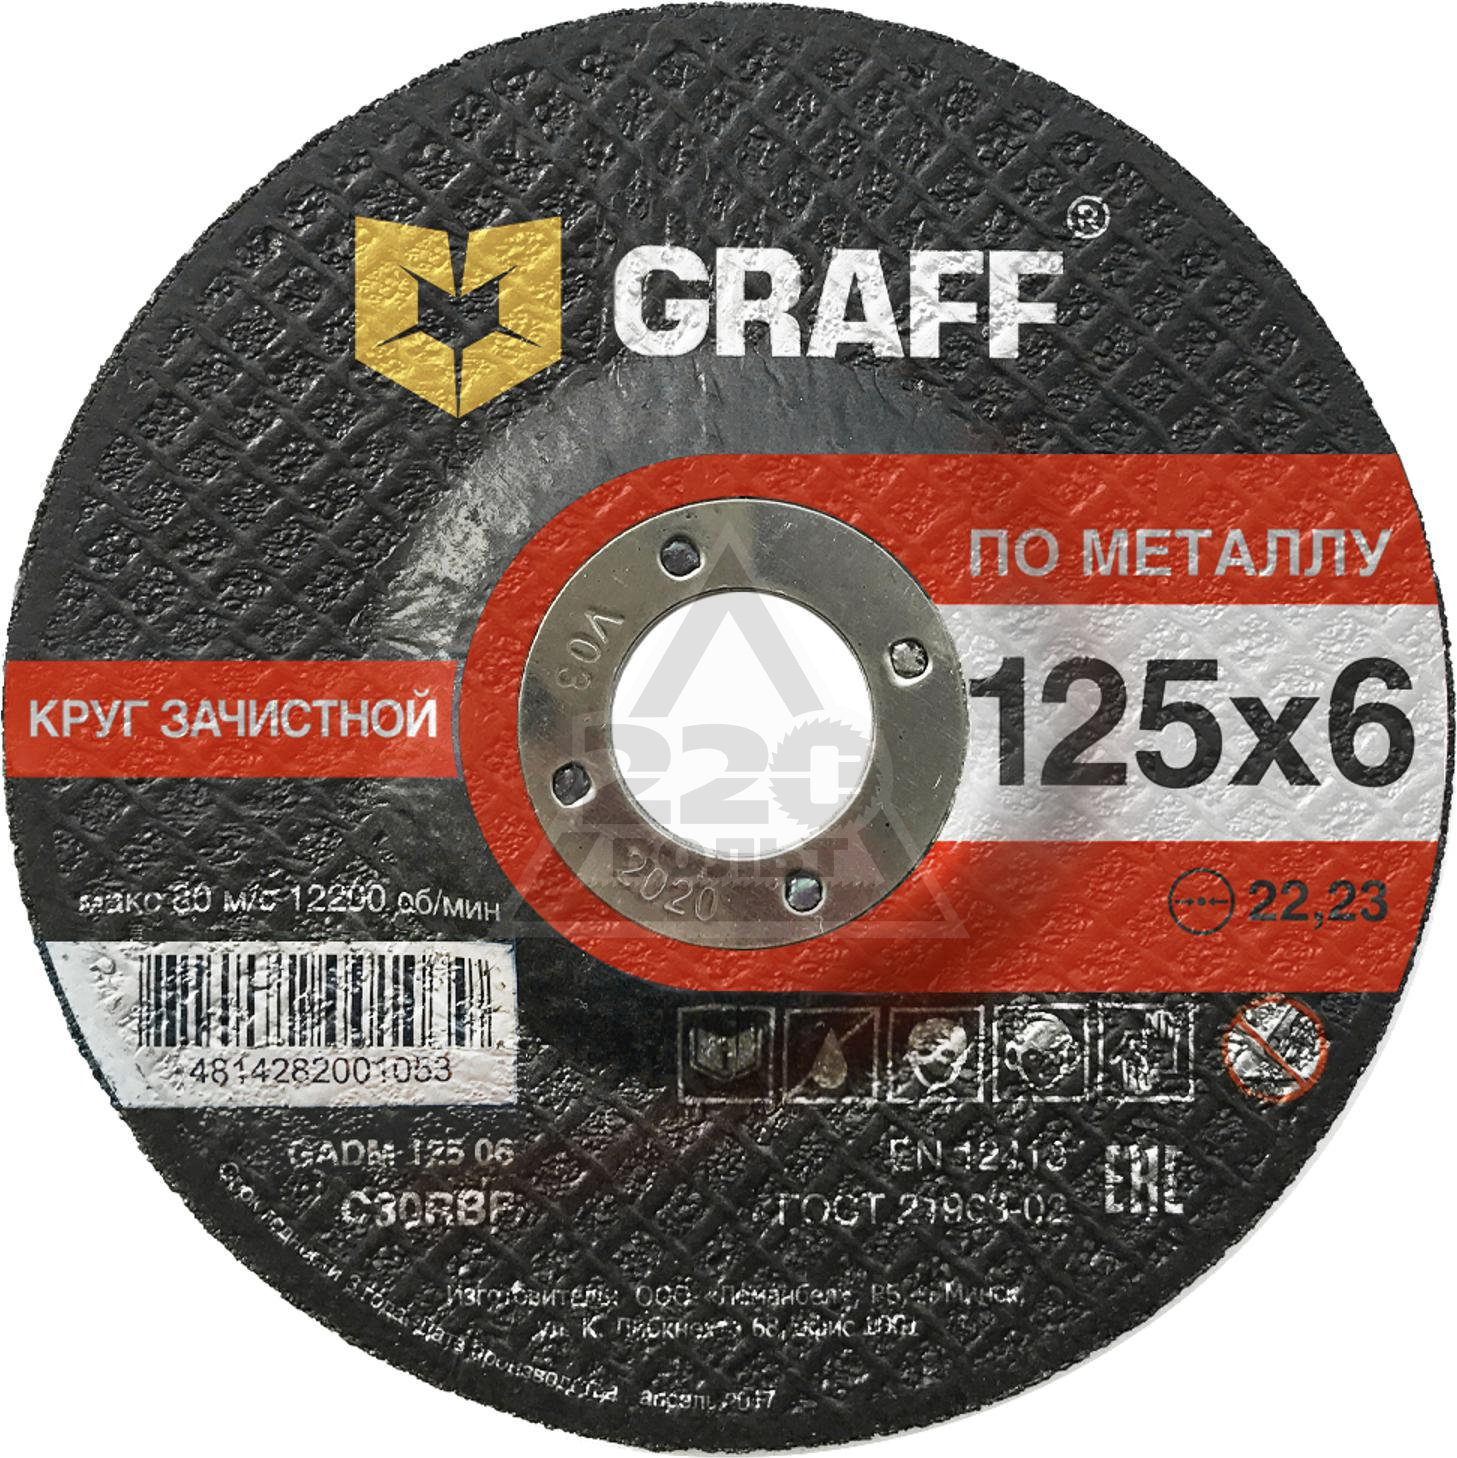 Circle Grinding GRAFF GADM 125 06